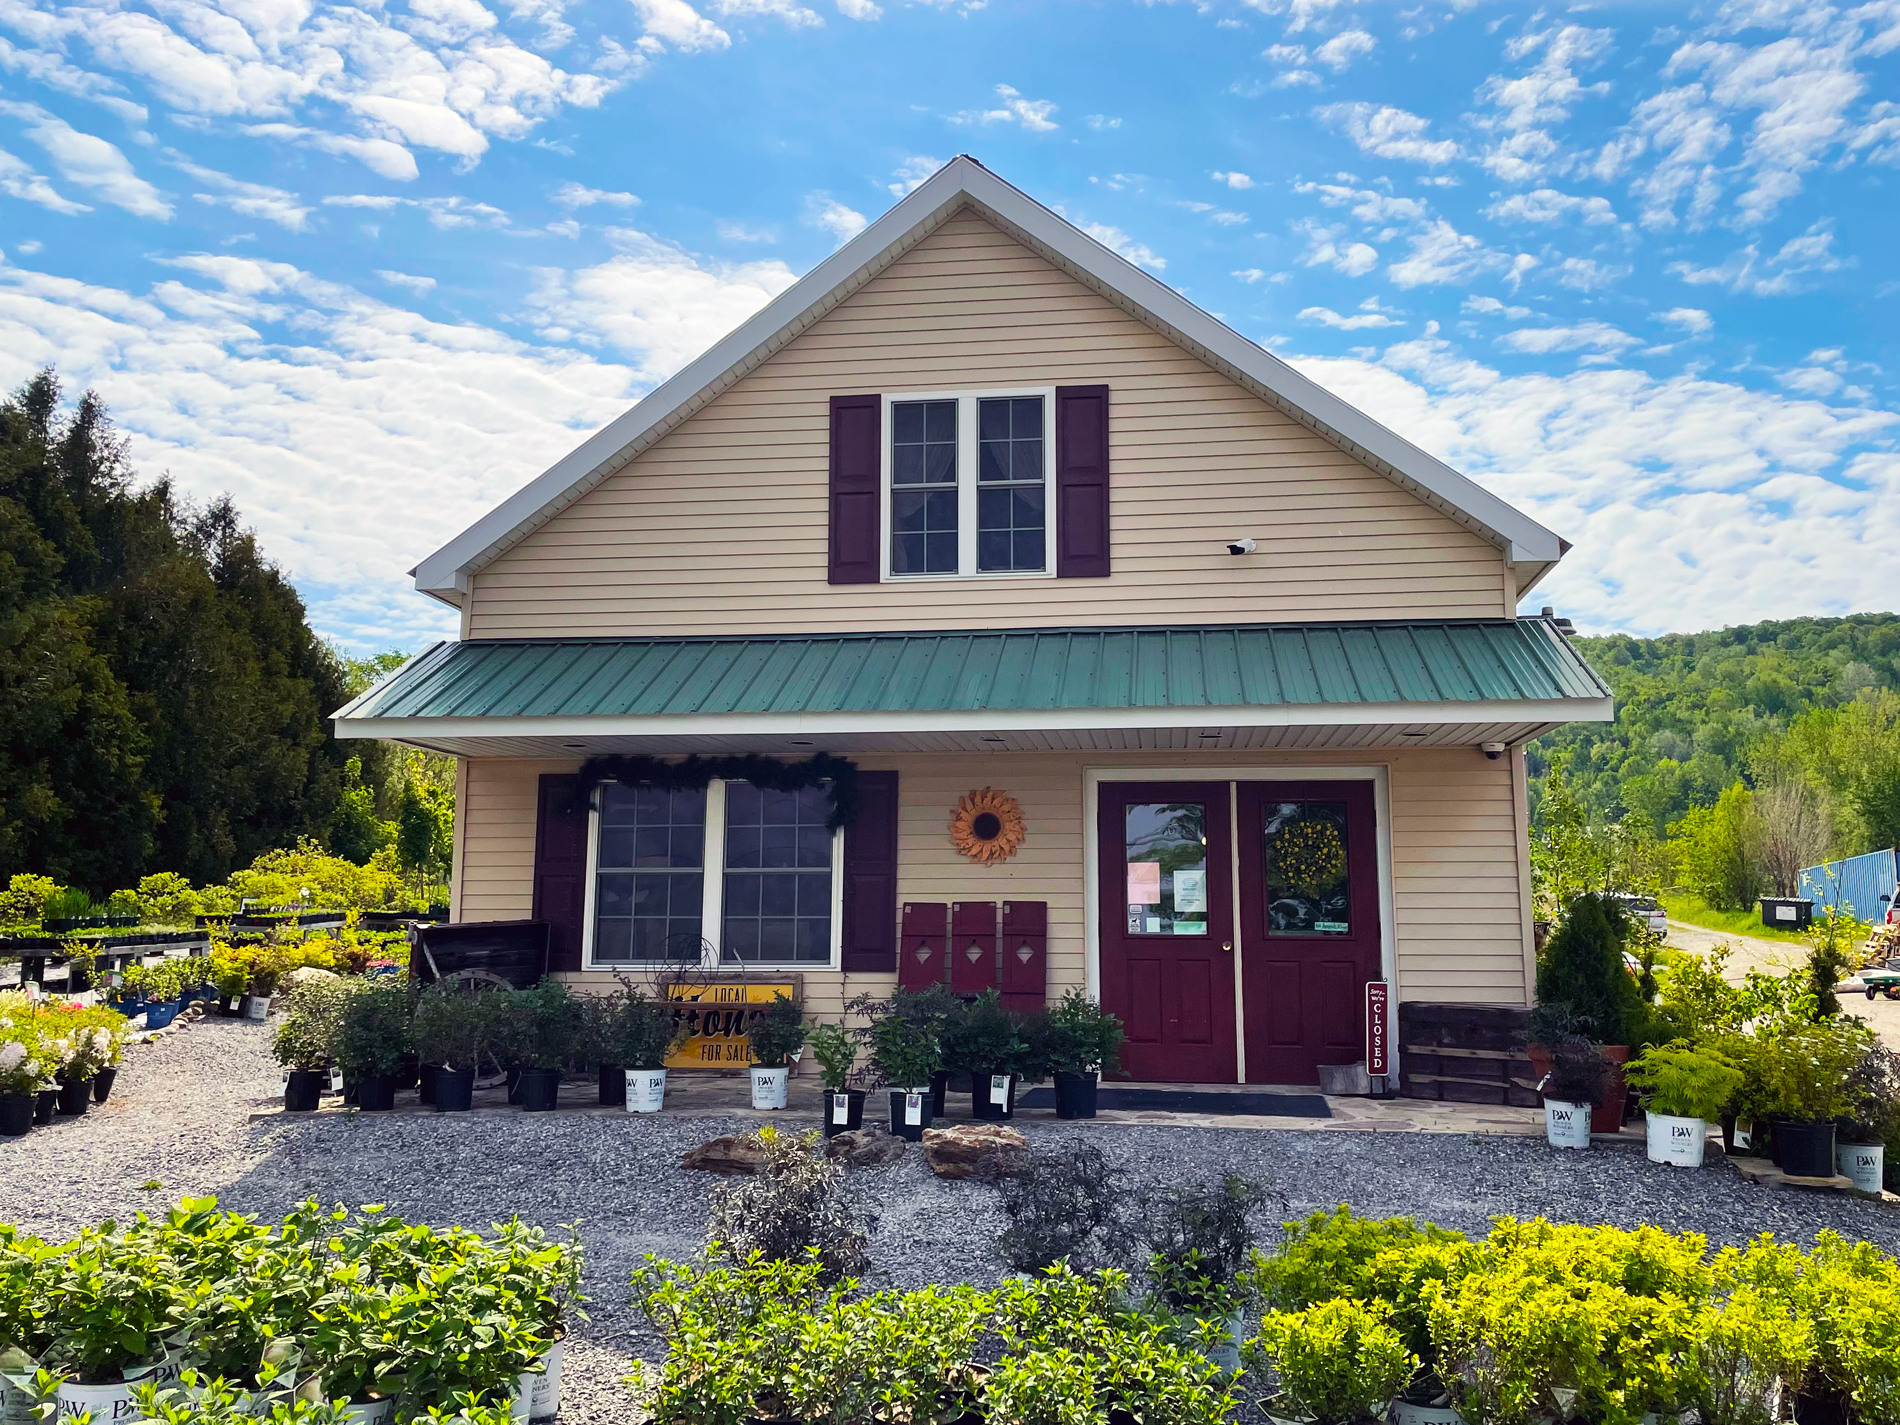 Breezy Acres Primitive Barn in St. Albans, Vermont